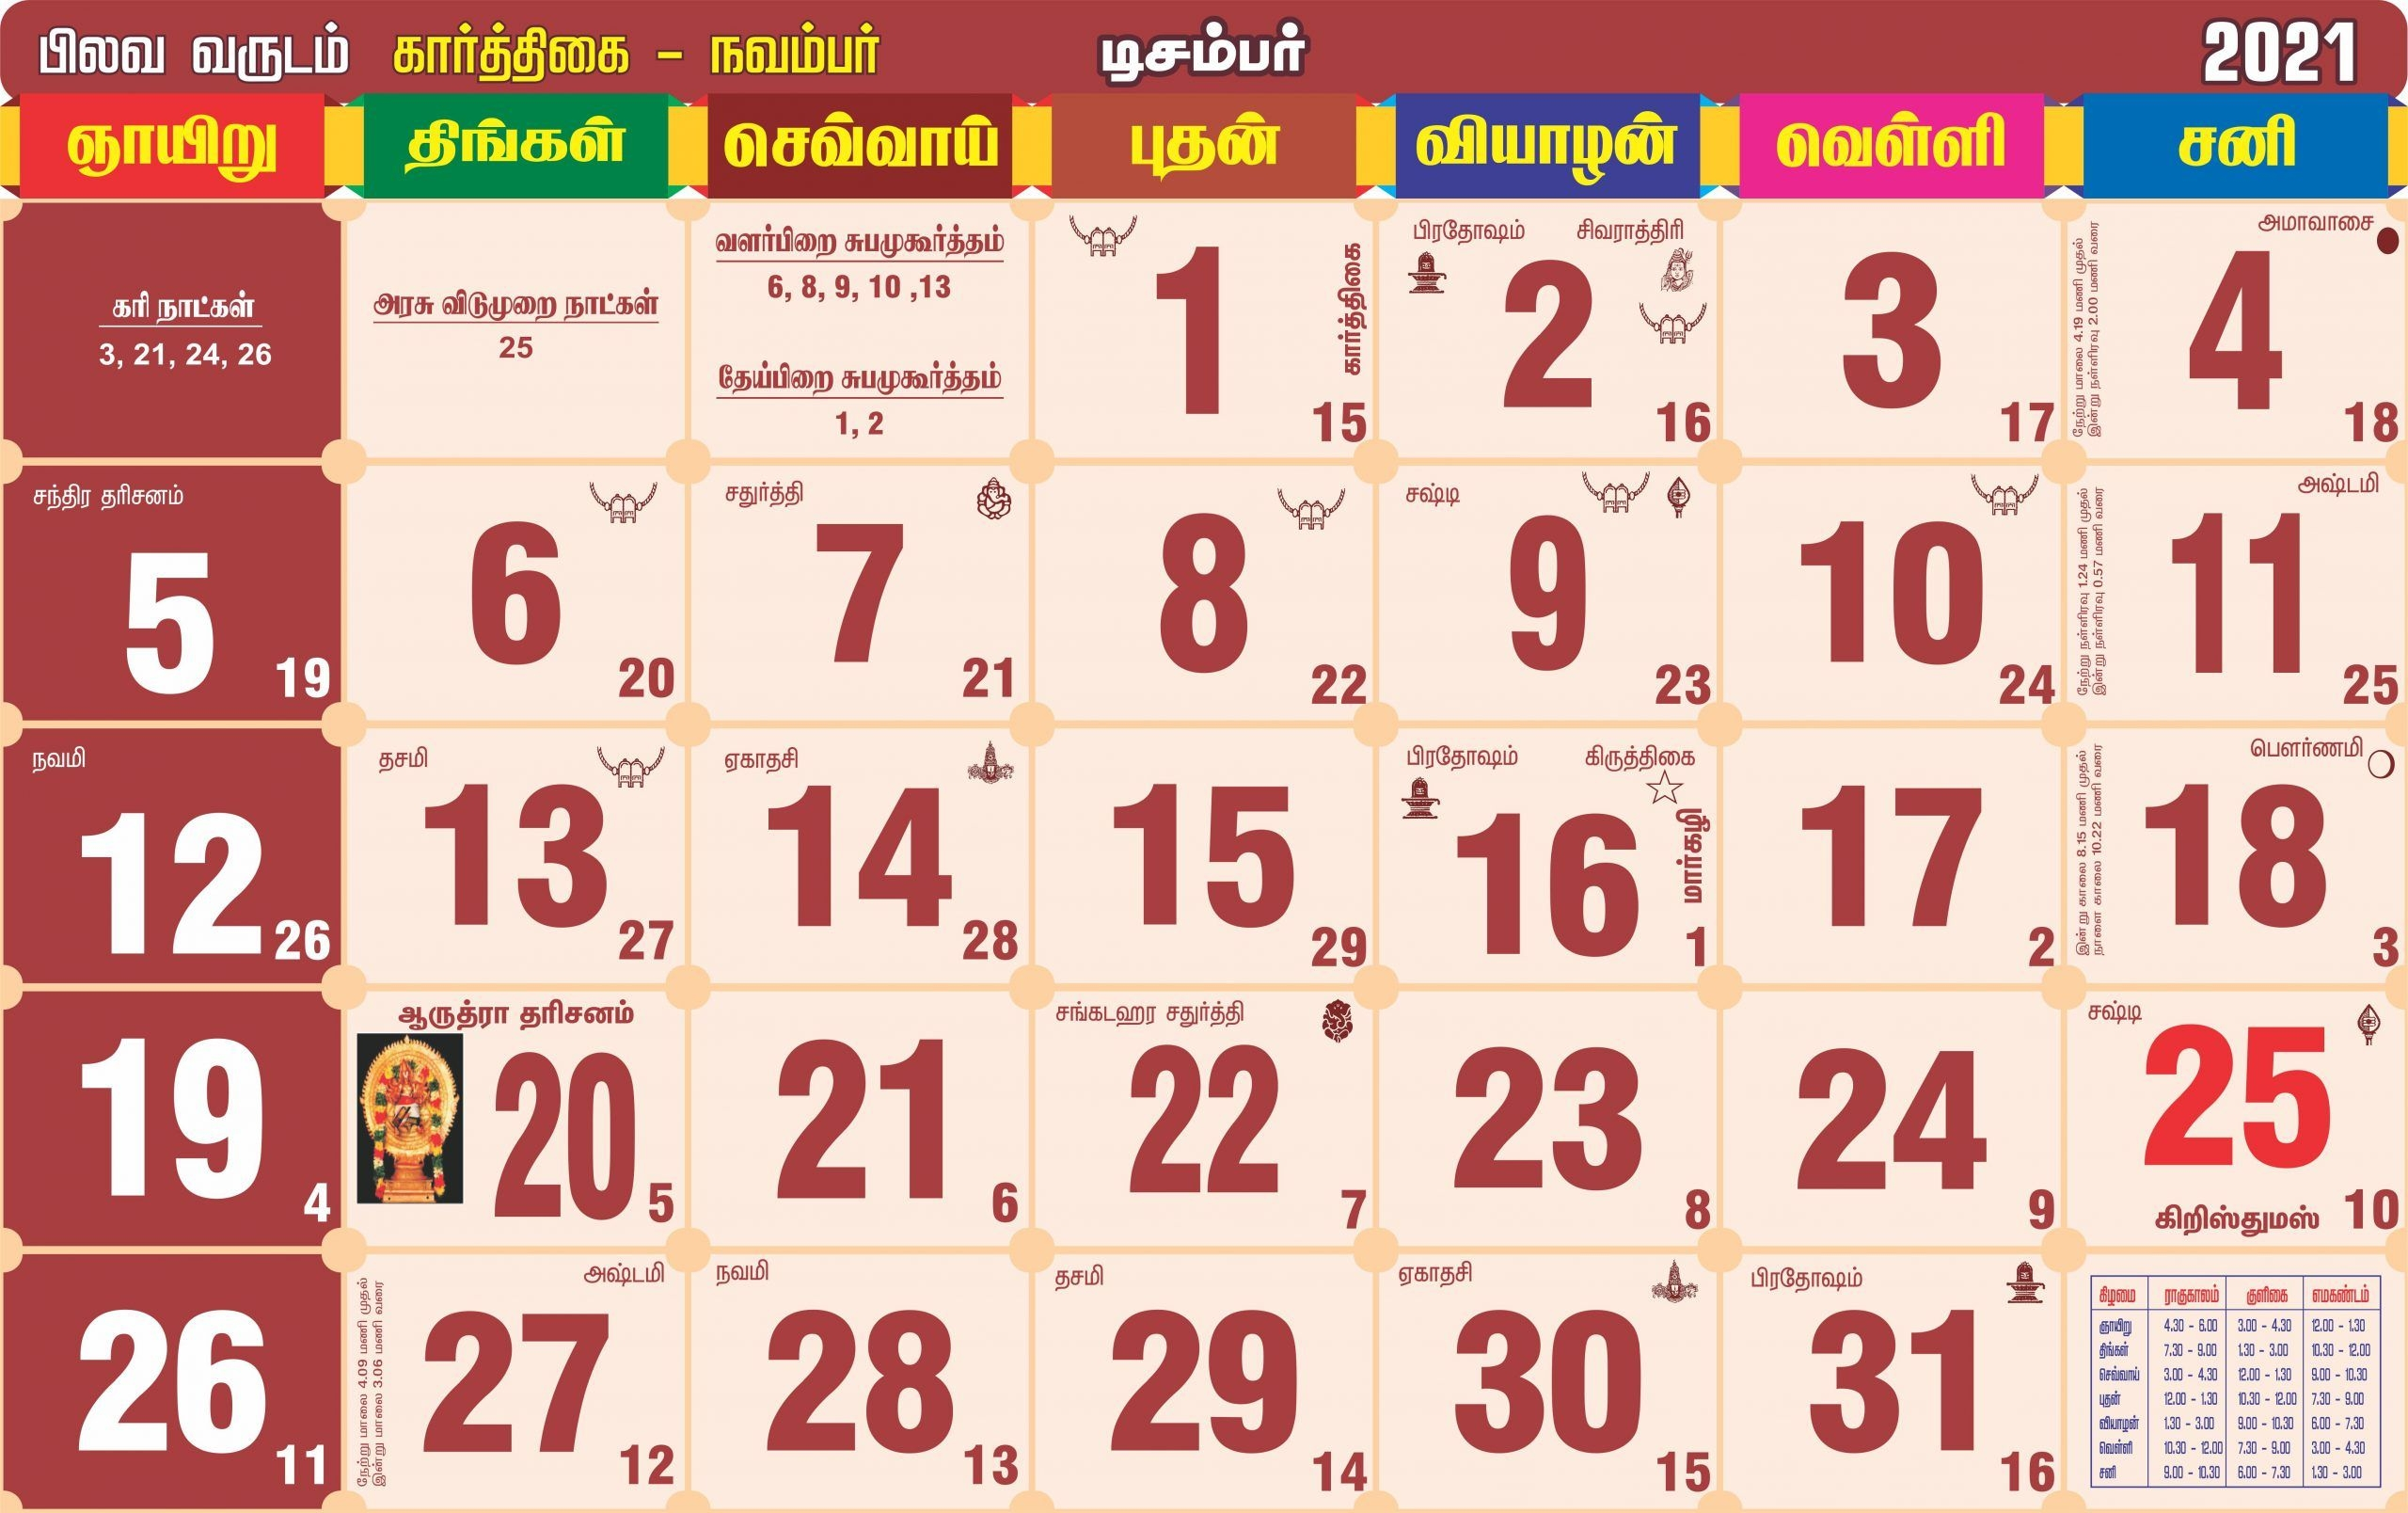 Tamil Monthly Calendar 2021 - தமிழ் மாத காலண்டர் 2021